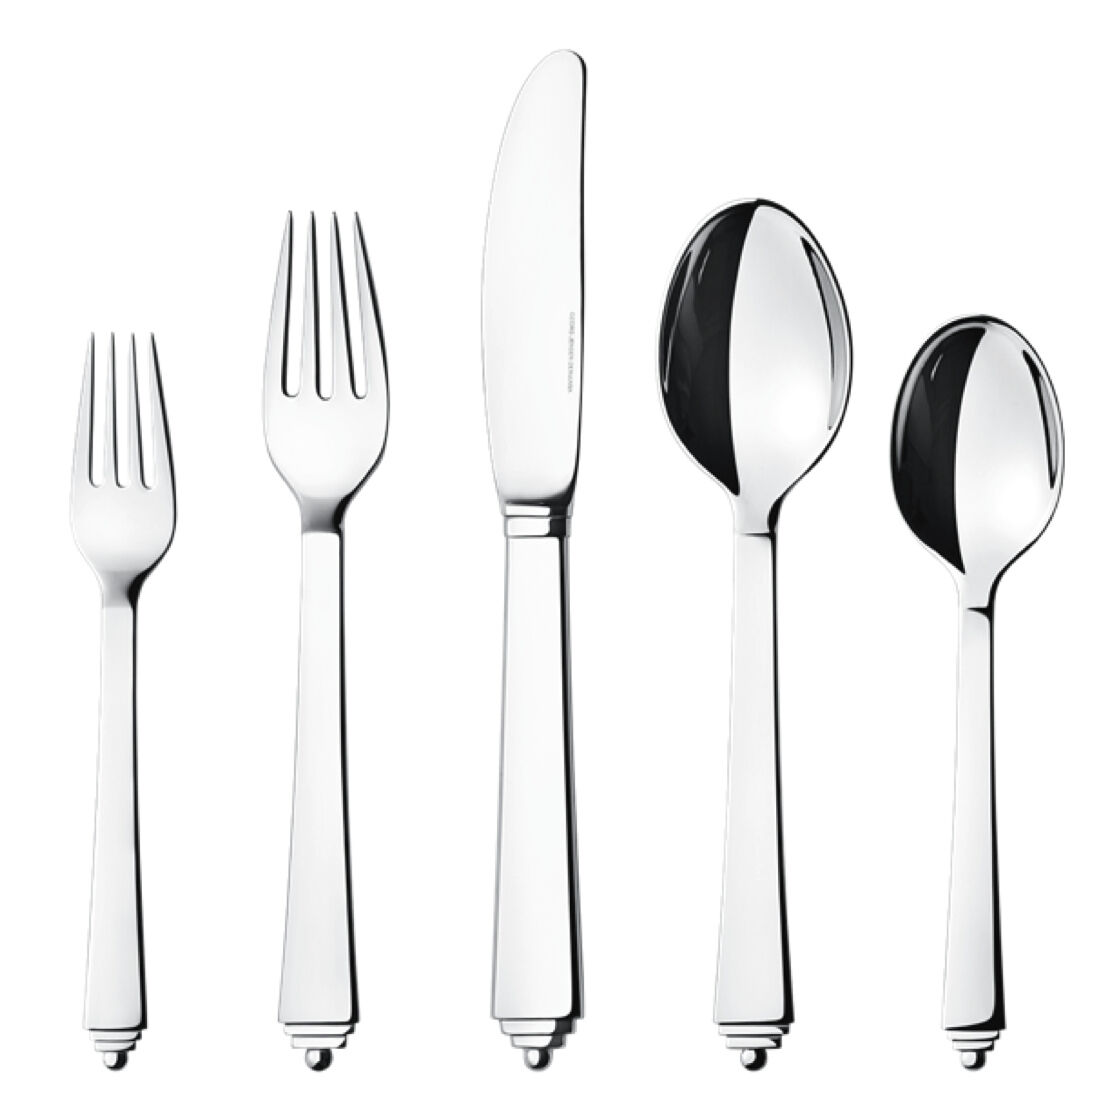 Georg Jensen Pyramid Cutlery. Five Pieces Set   Stainless steel